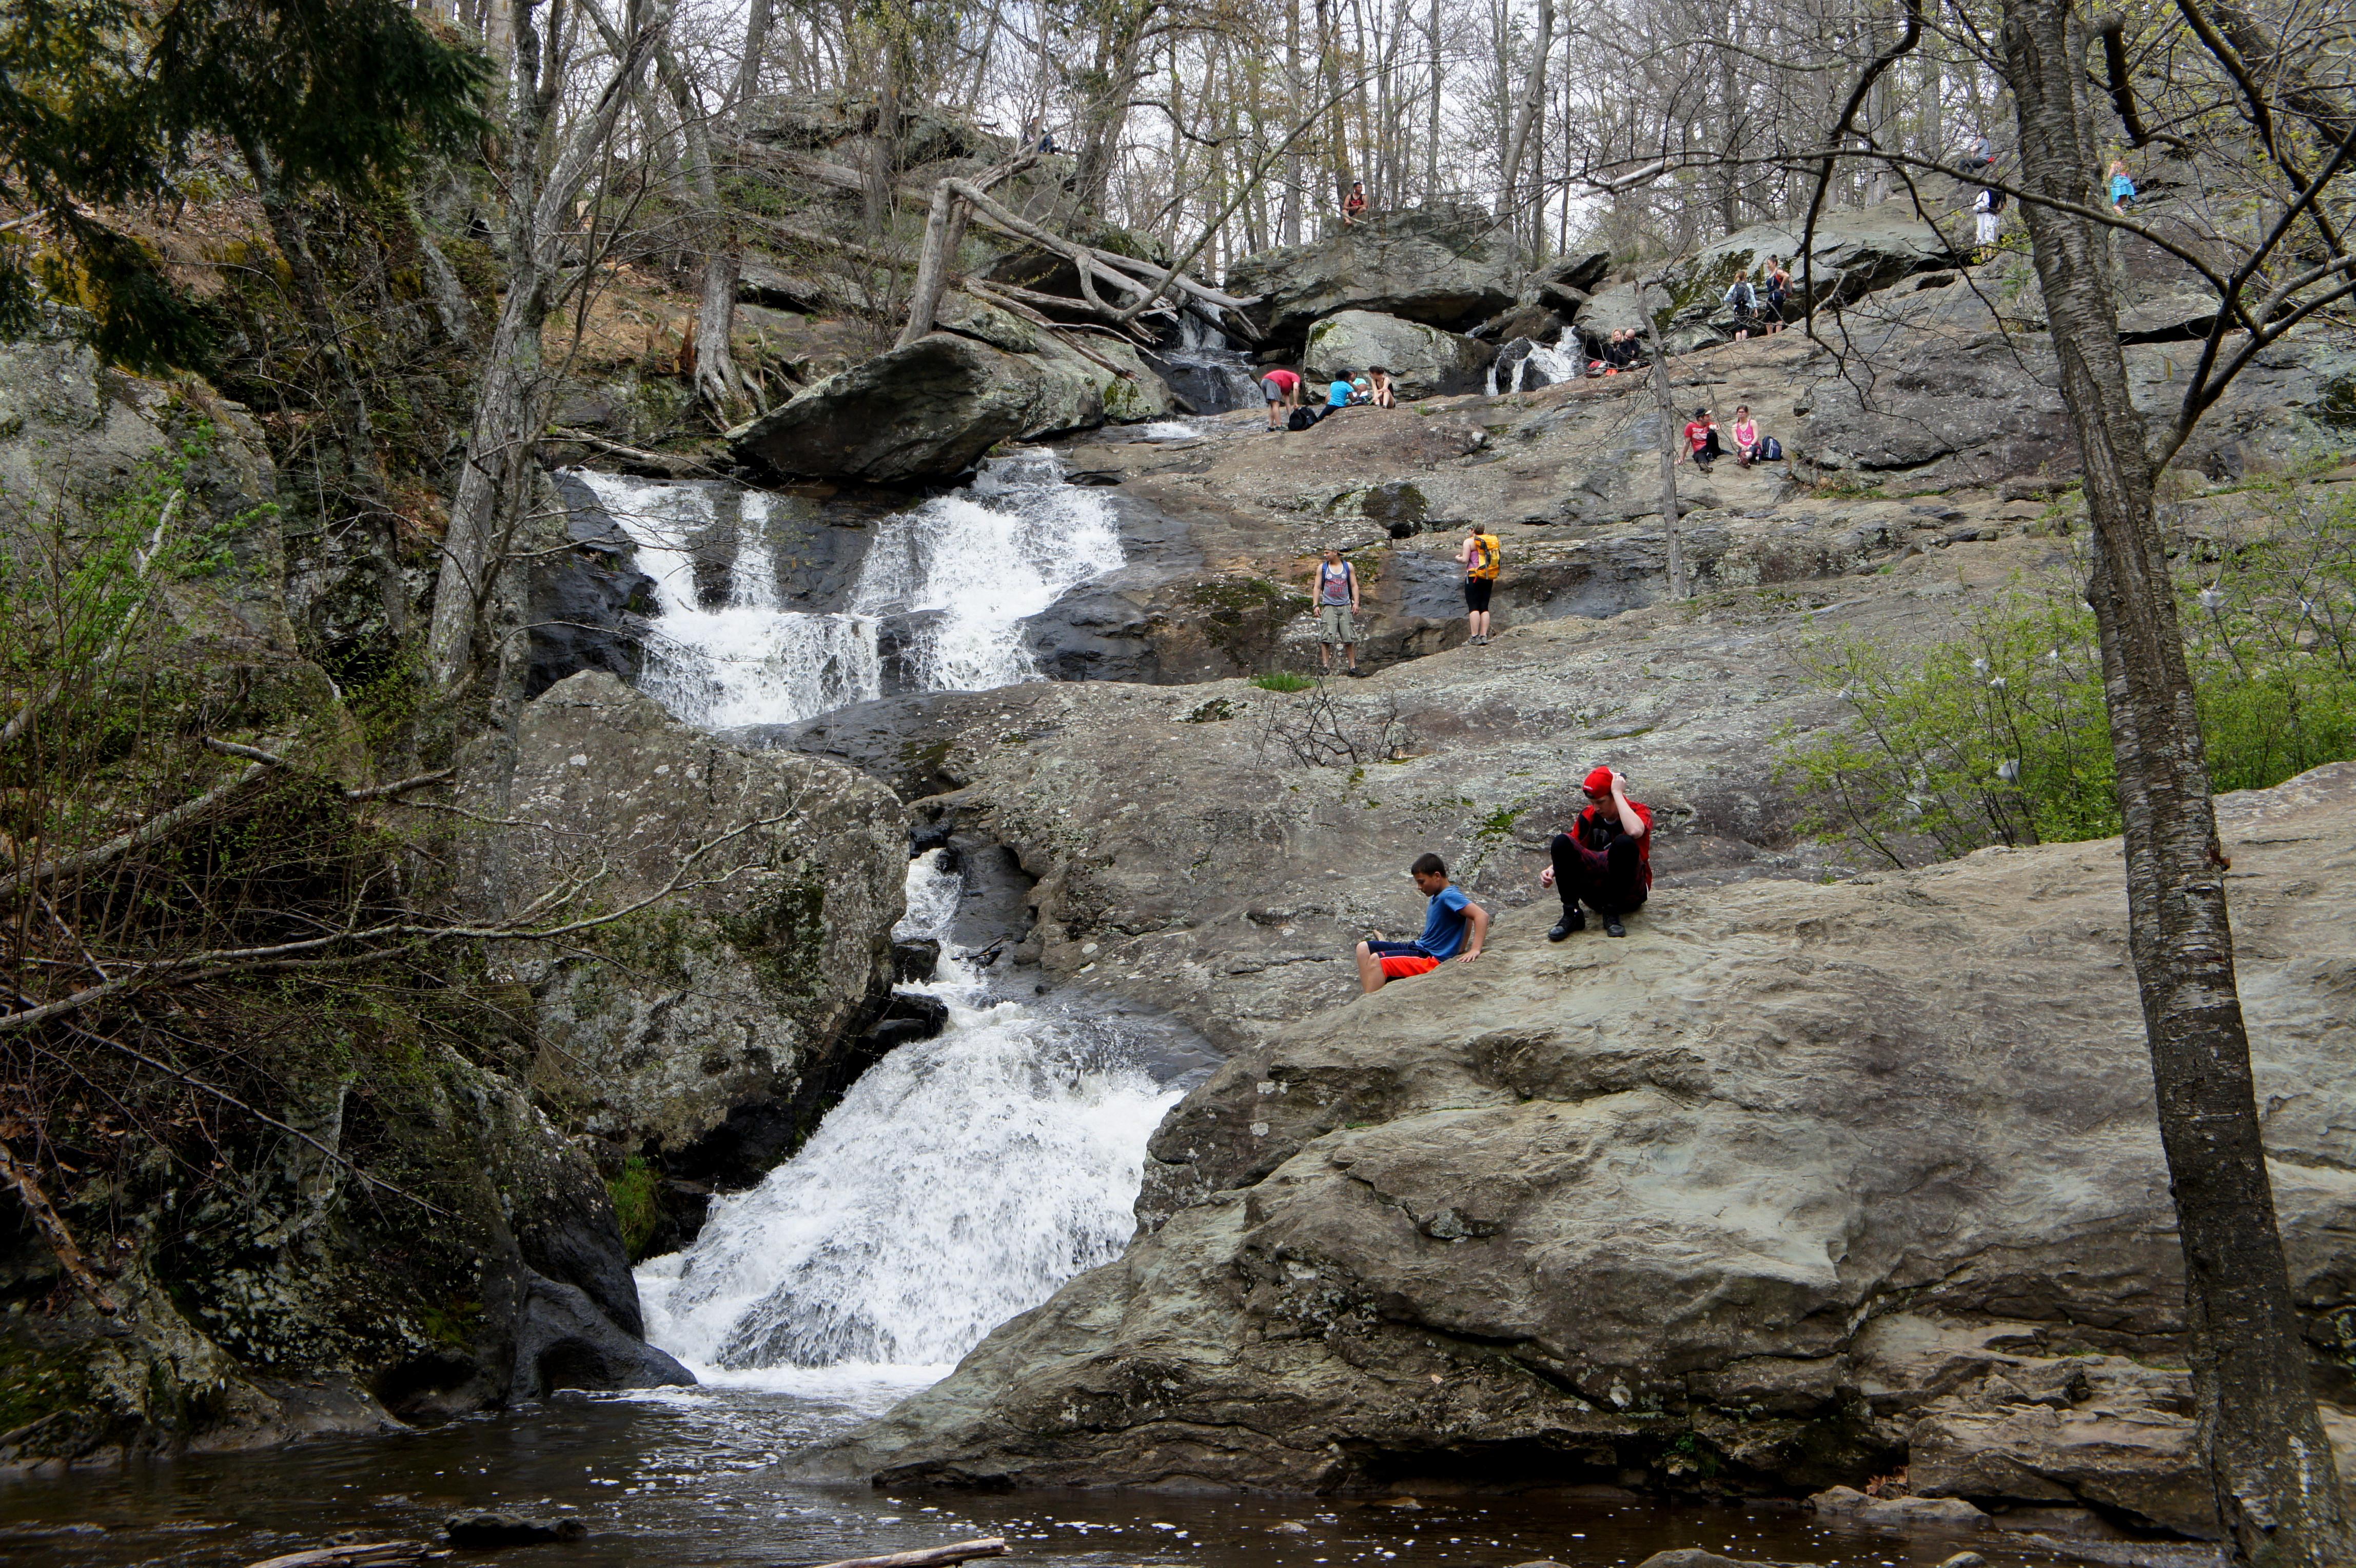 Cunningham falls state park